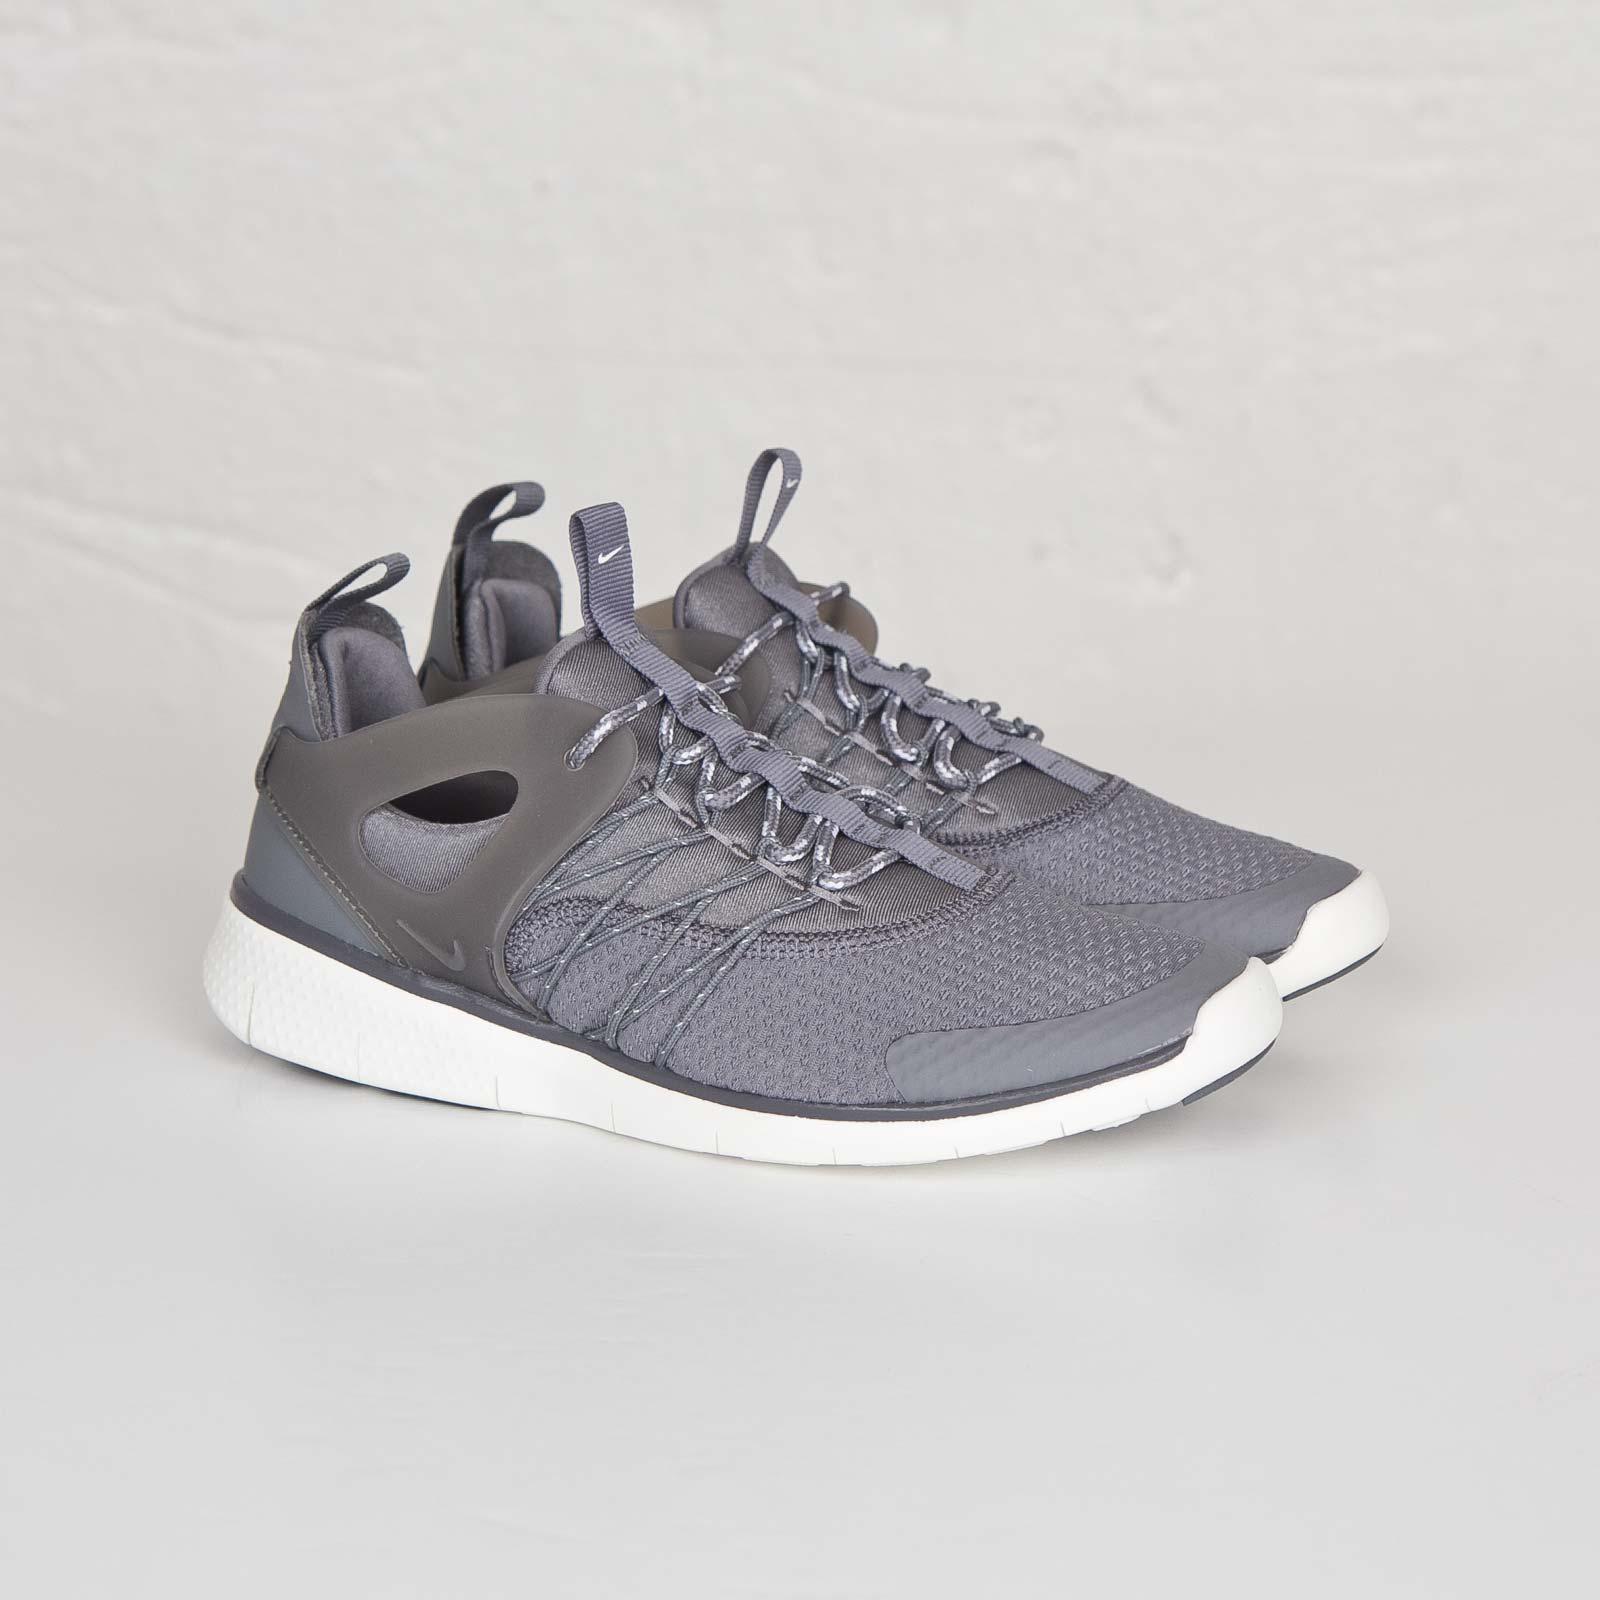 a14d1ef046 Nike Wmns Free Viritous - 725060-004 - Sneakersnstuff